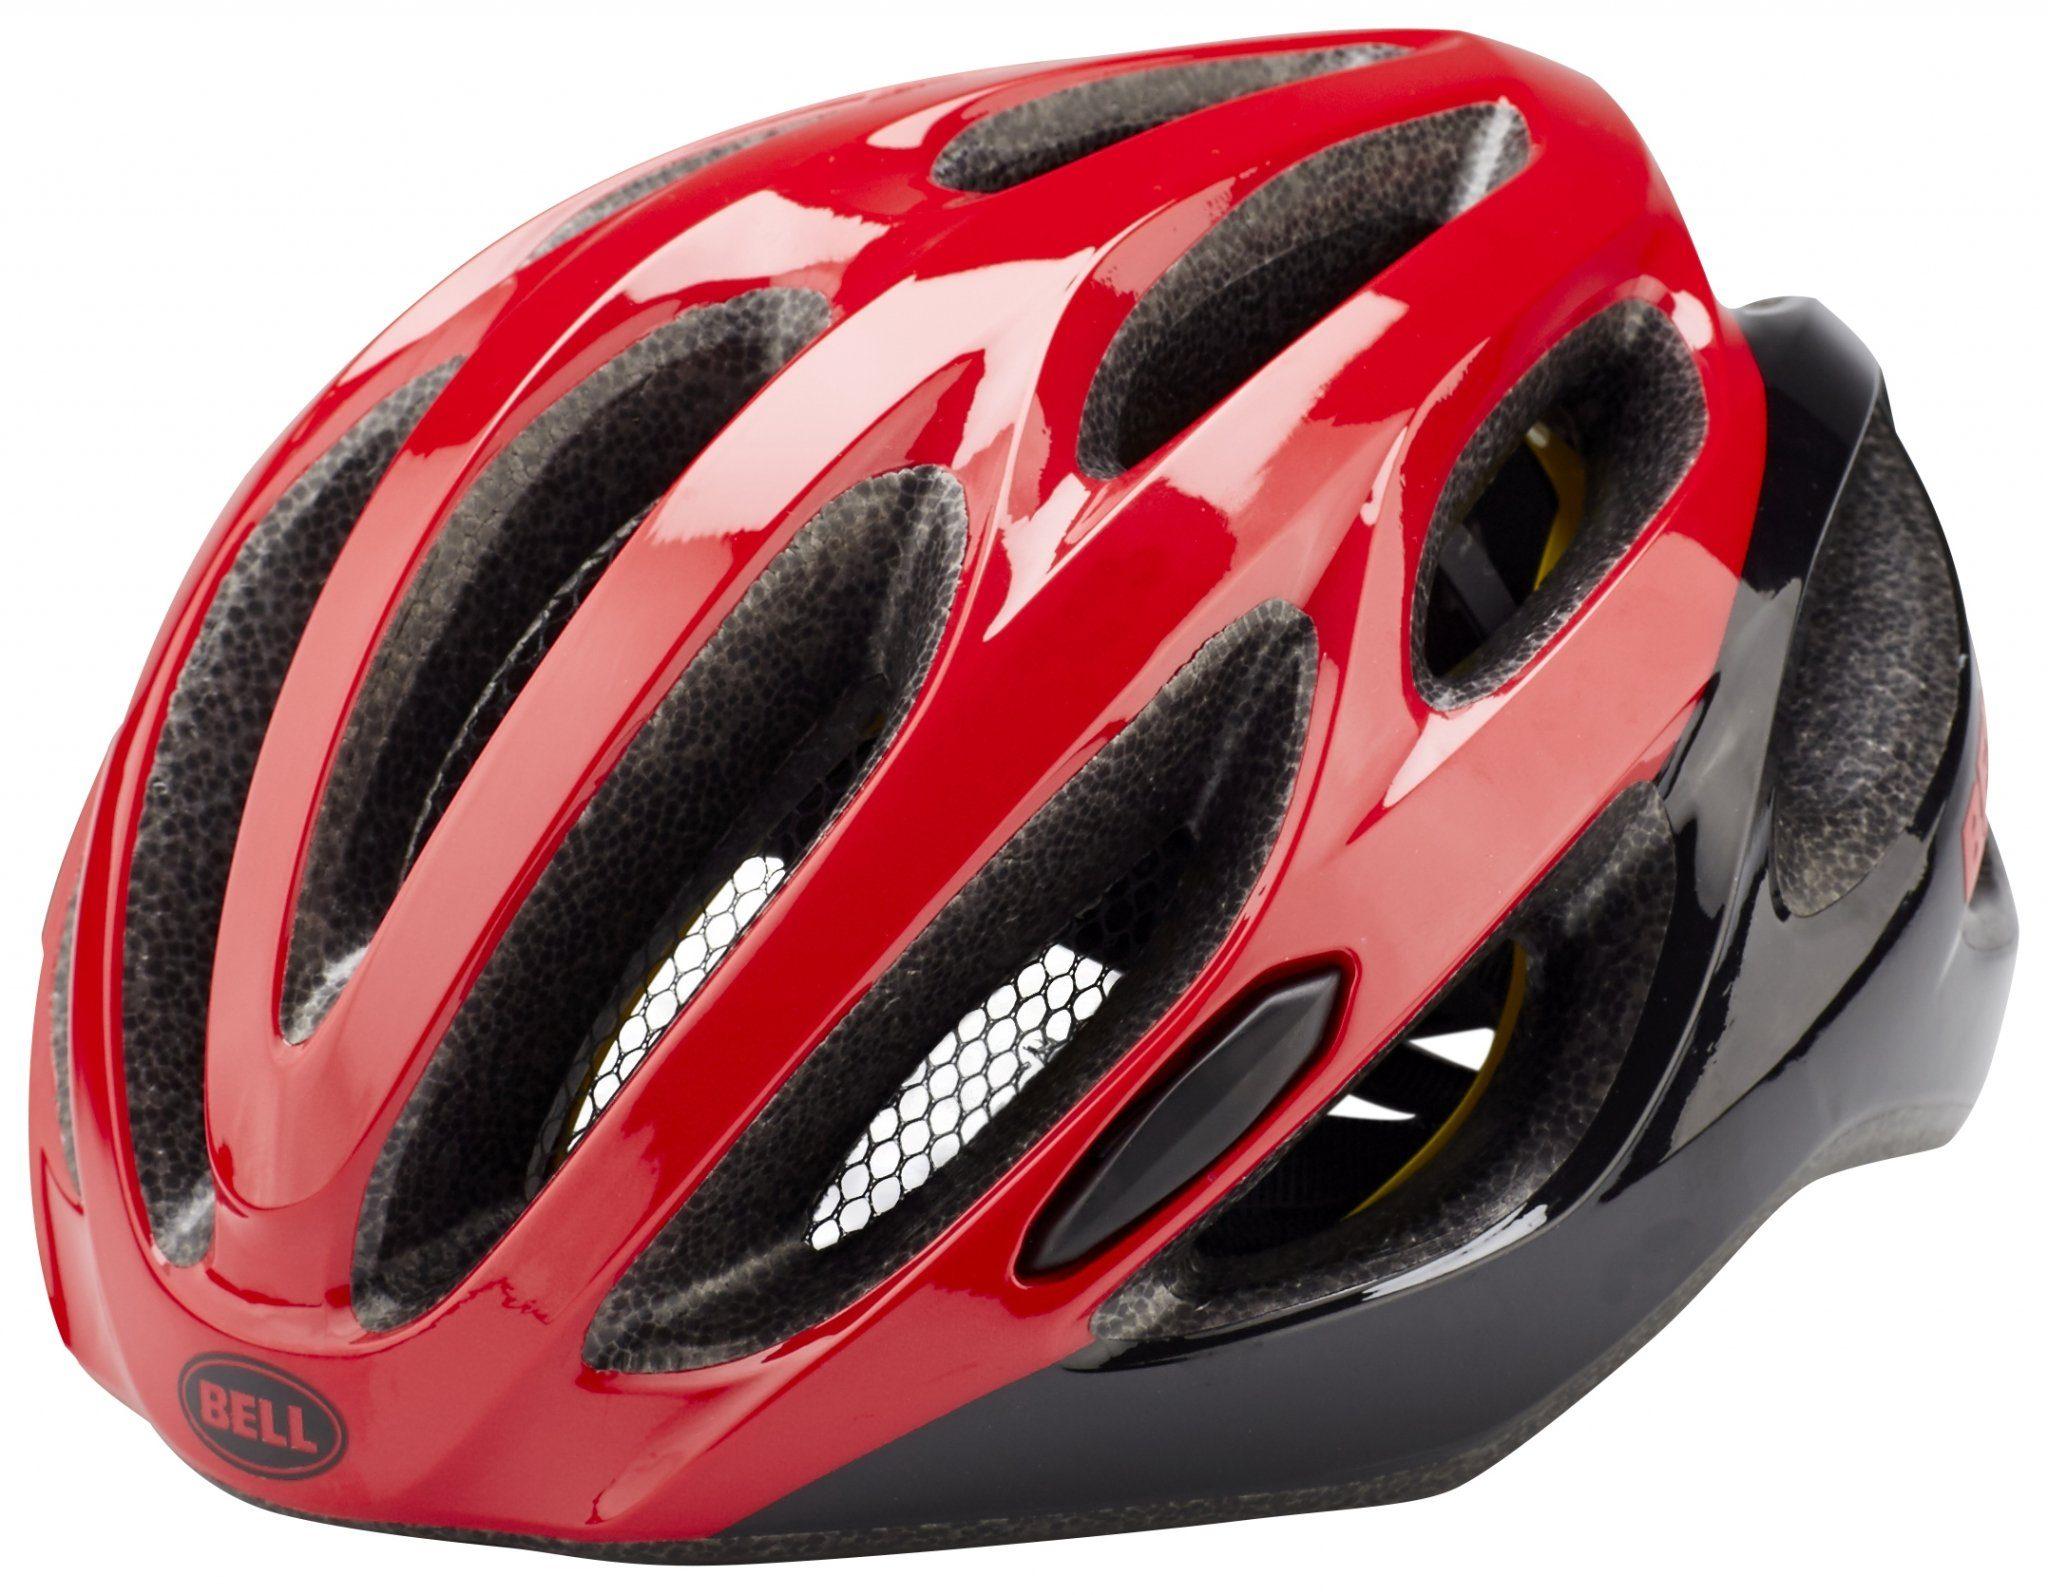 Bell Fahrradhelm »Draft Mips Helmet«